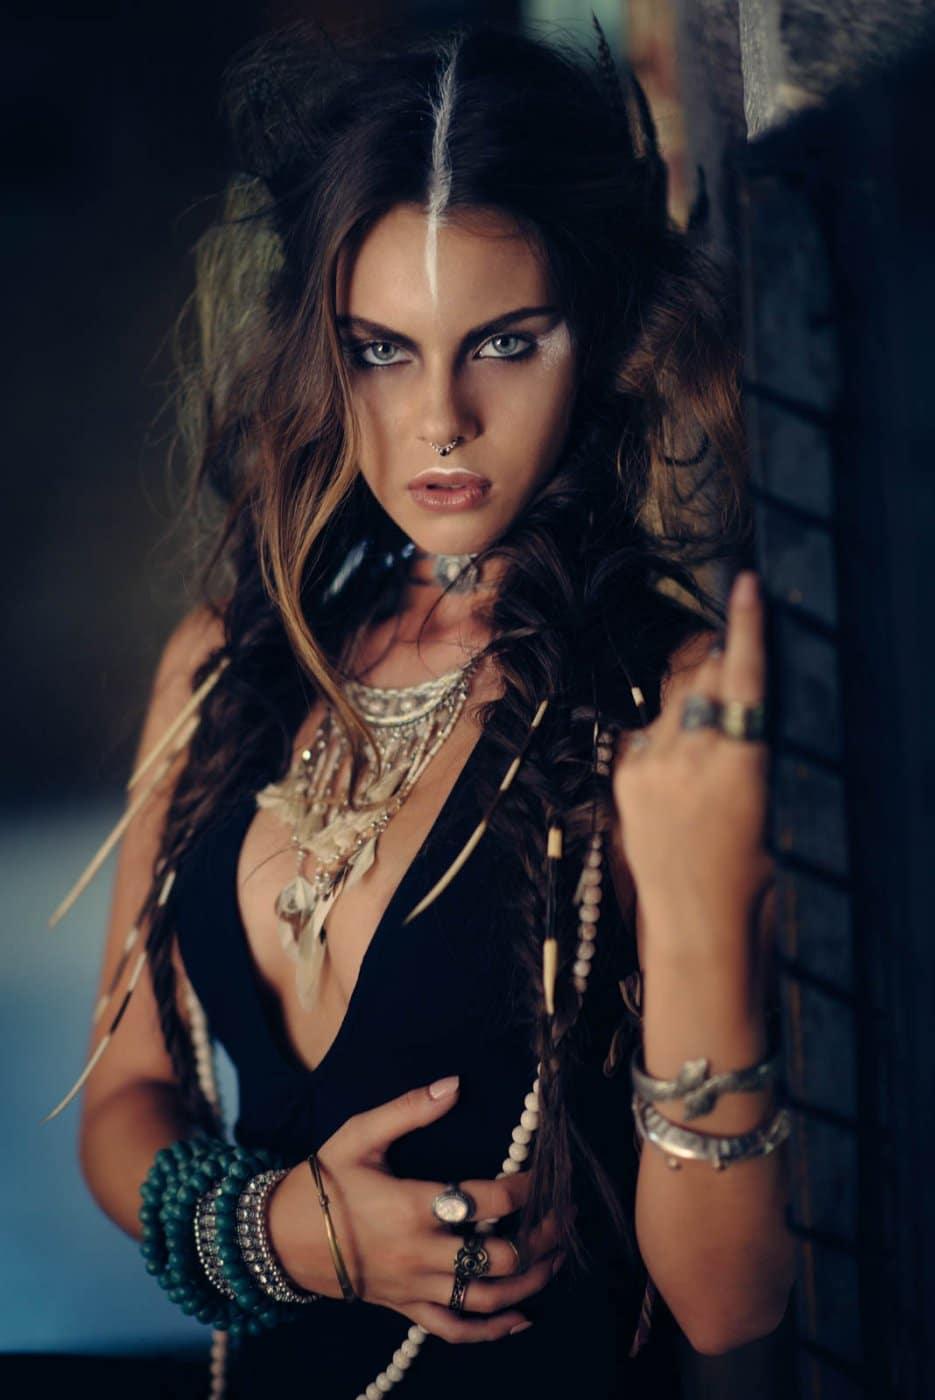 Portrait Photography By Anastasia Vervueren Tiziana Di Garbo Tribe